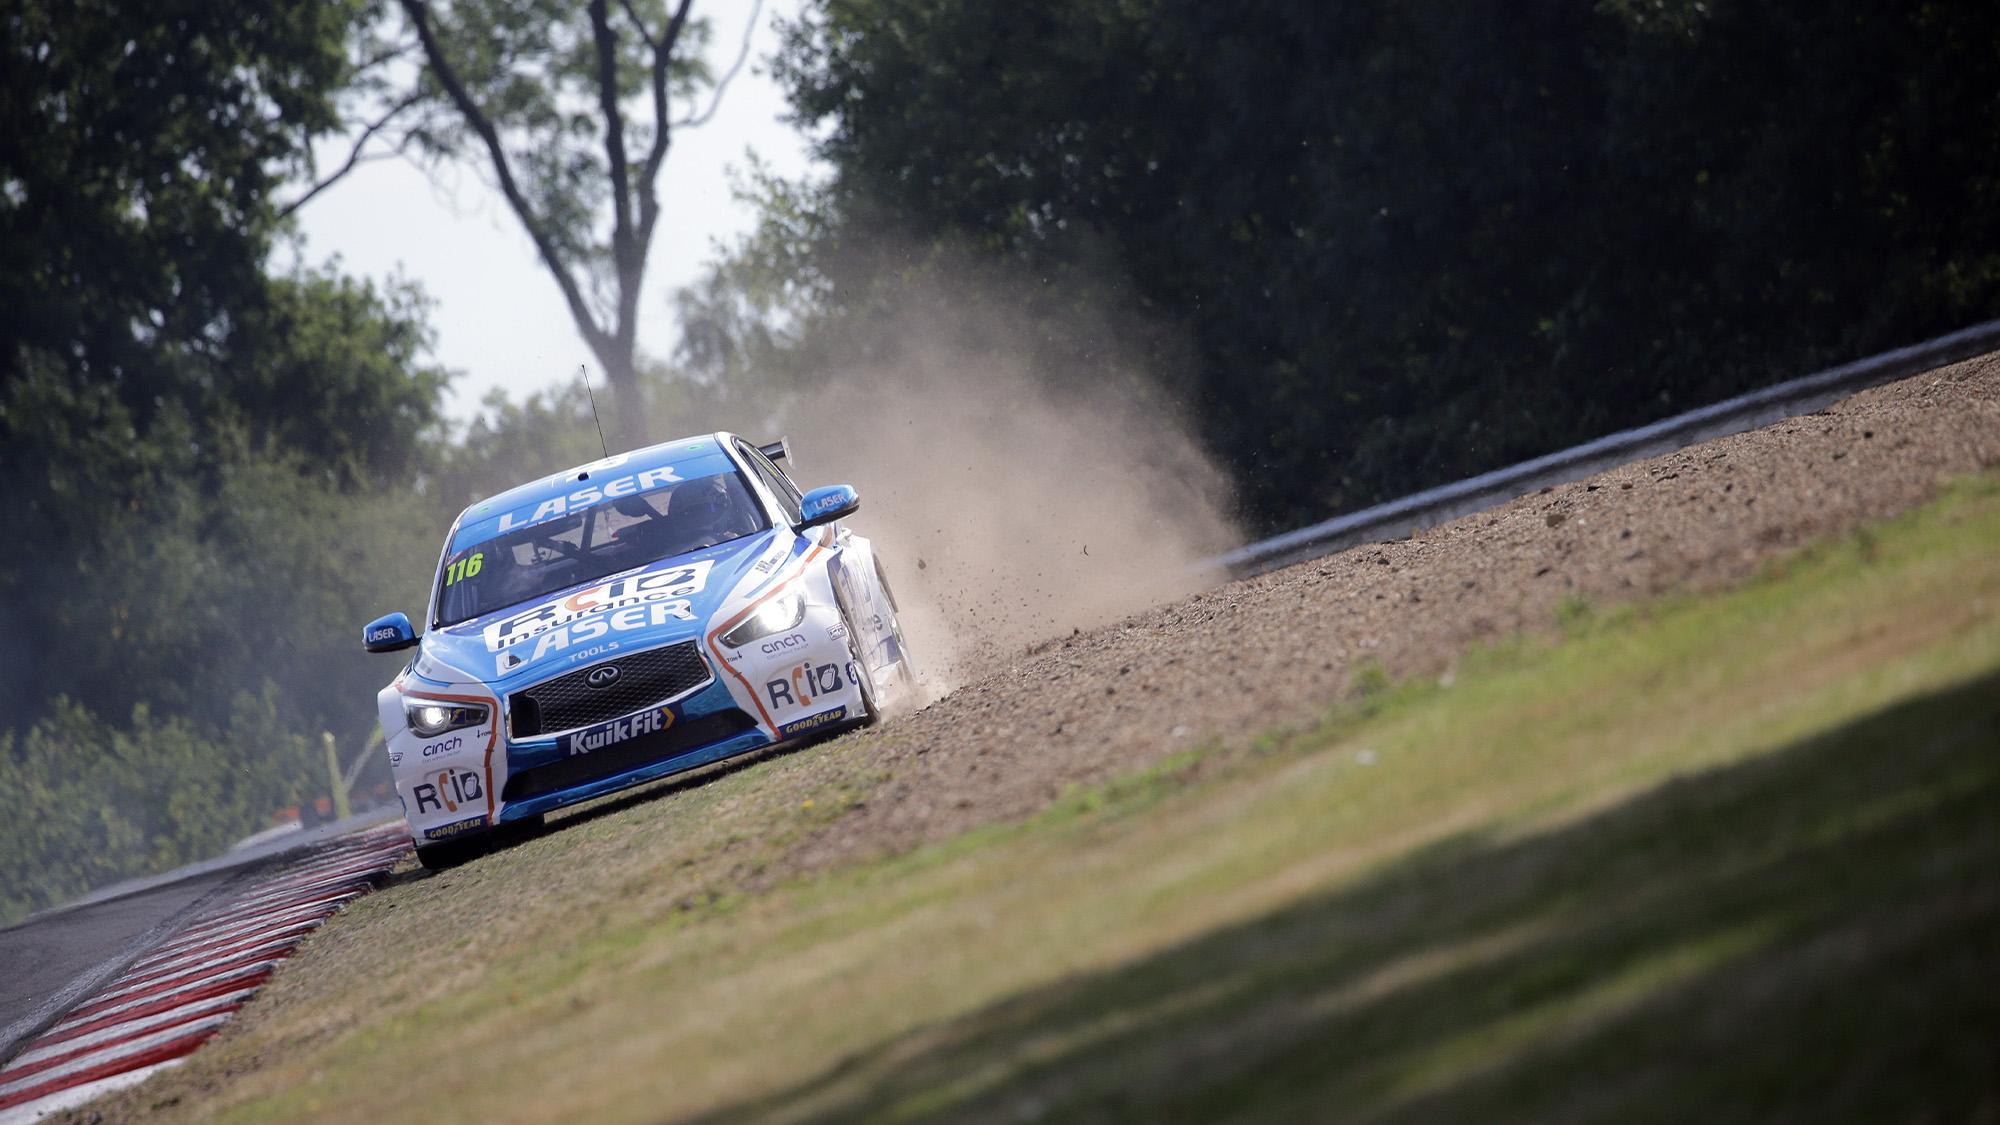 Ash Sutton runs off track at Brands Hatch GP in the 2020 BTCC meeting